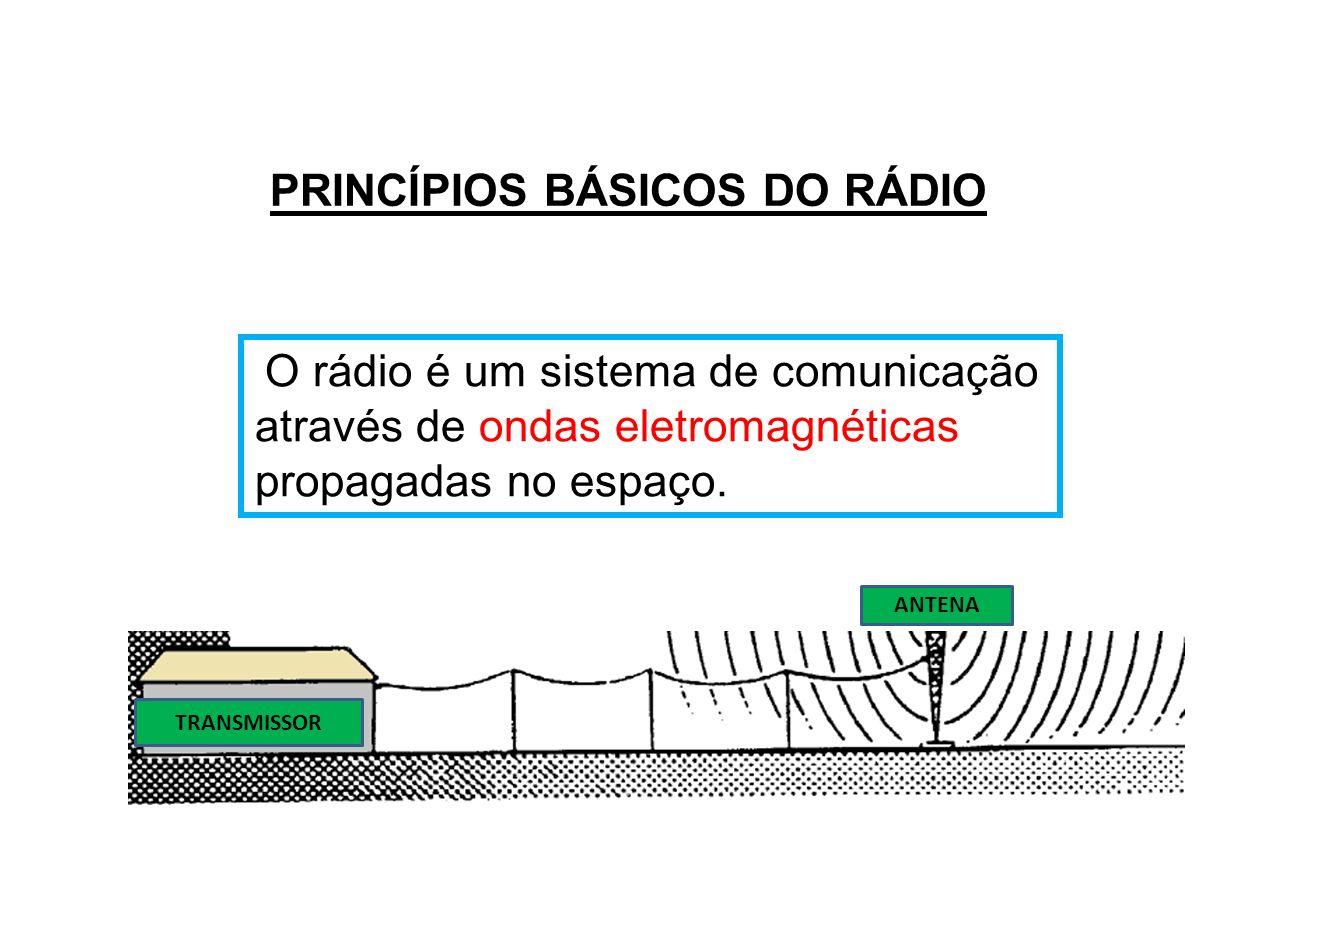 PRINCÍPIOS BÁSICOS DO RÁDIO